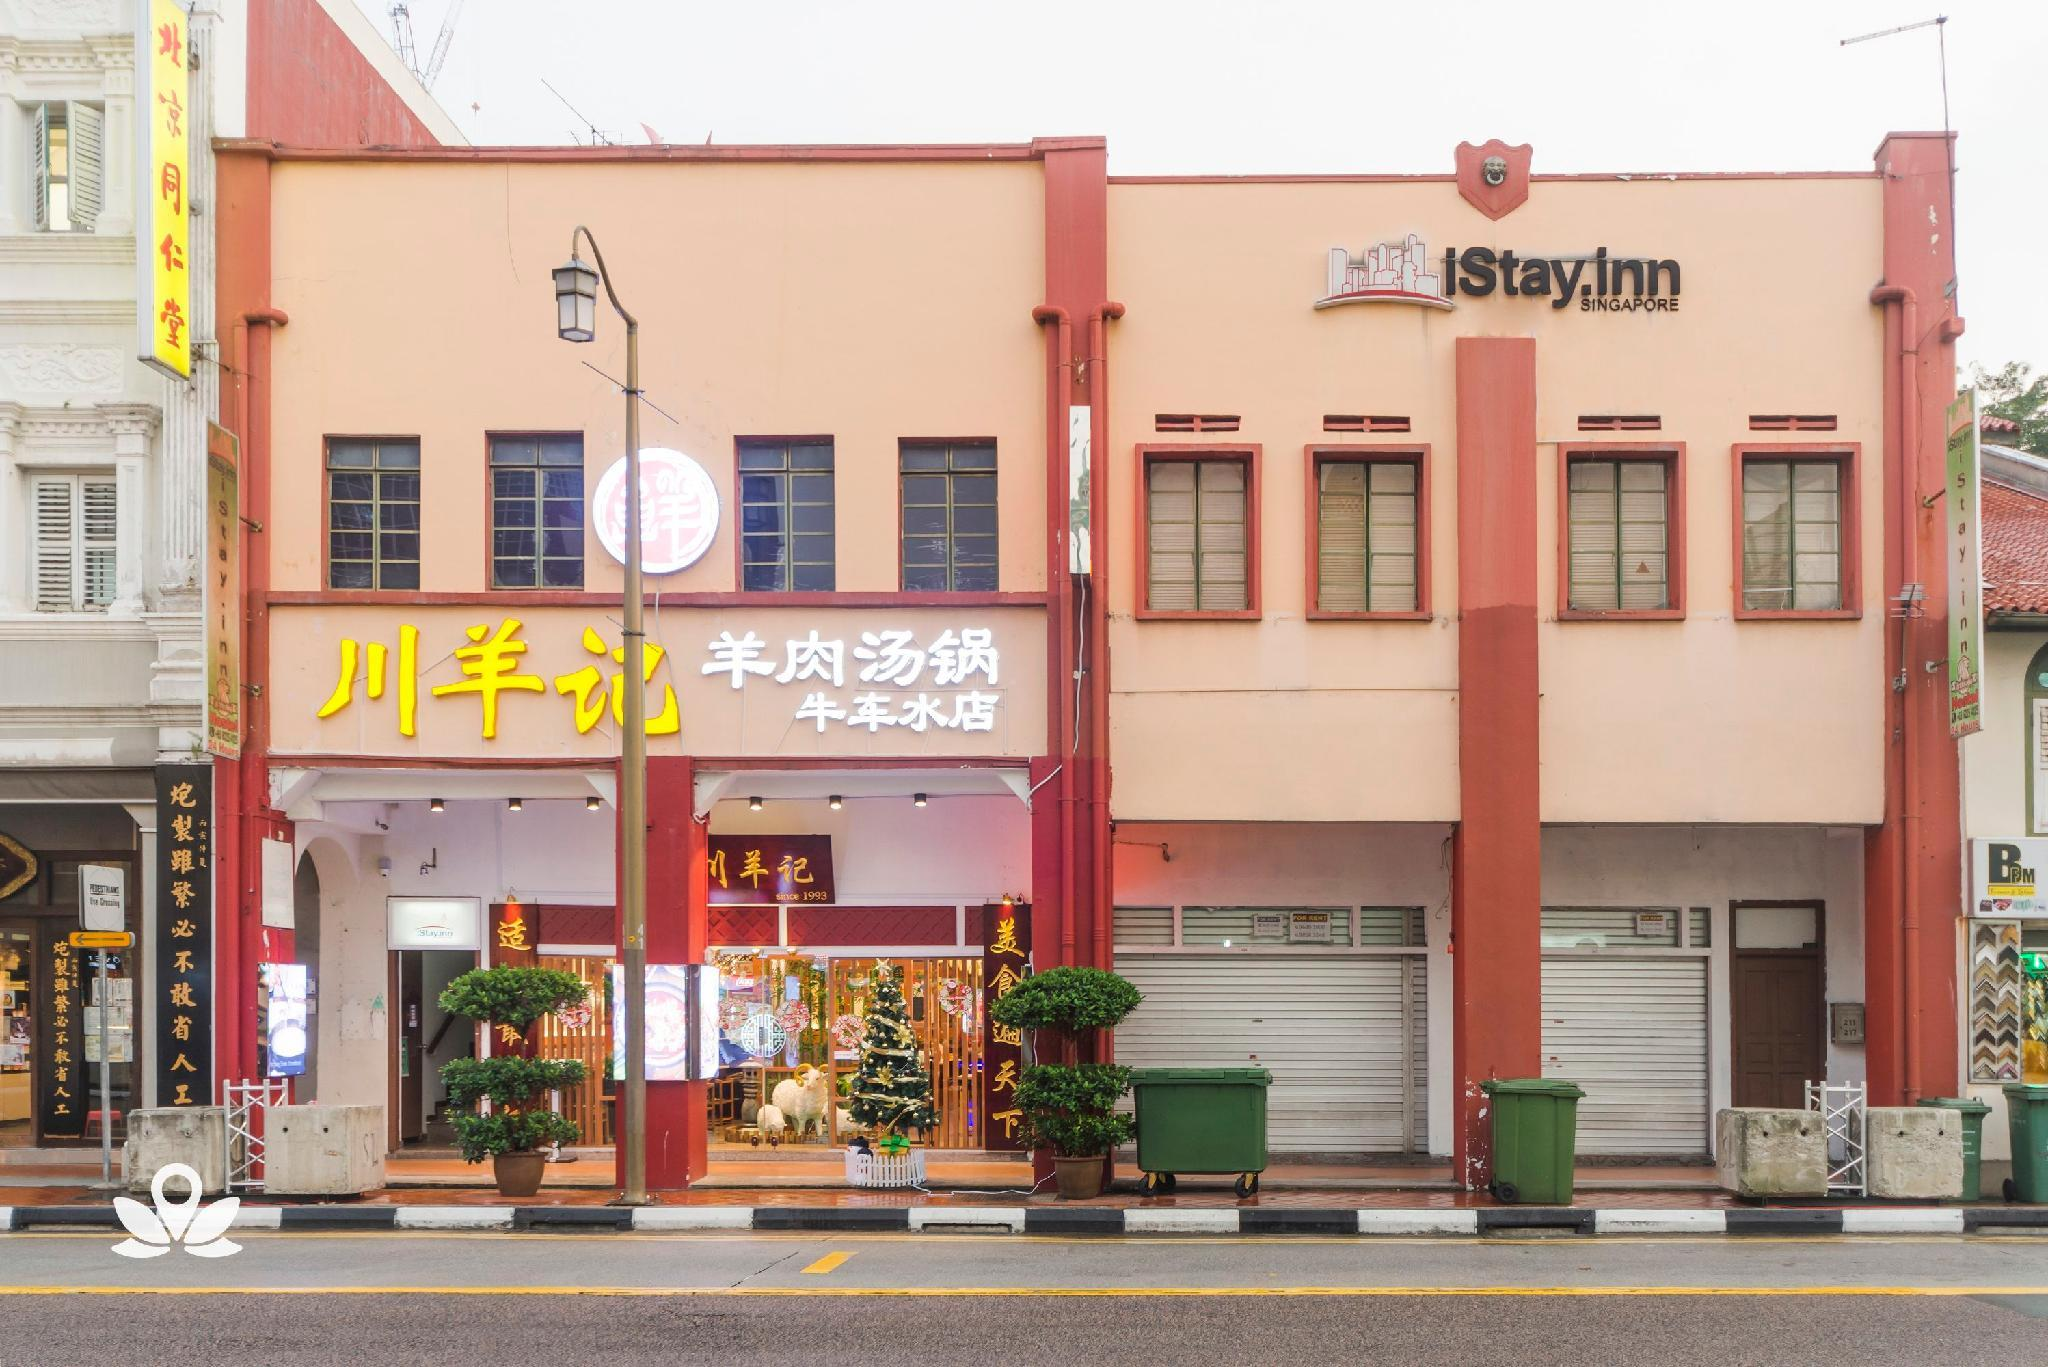 iStay.inn - an urban art hostel image